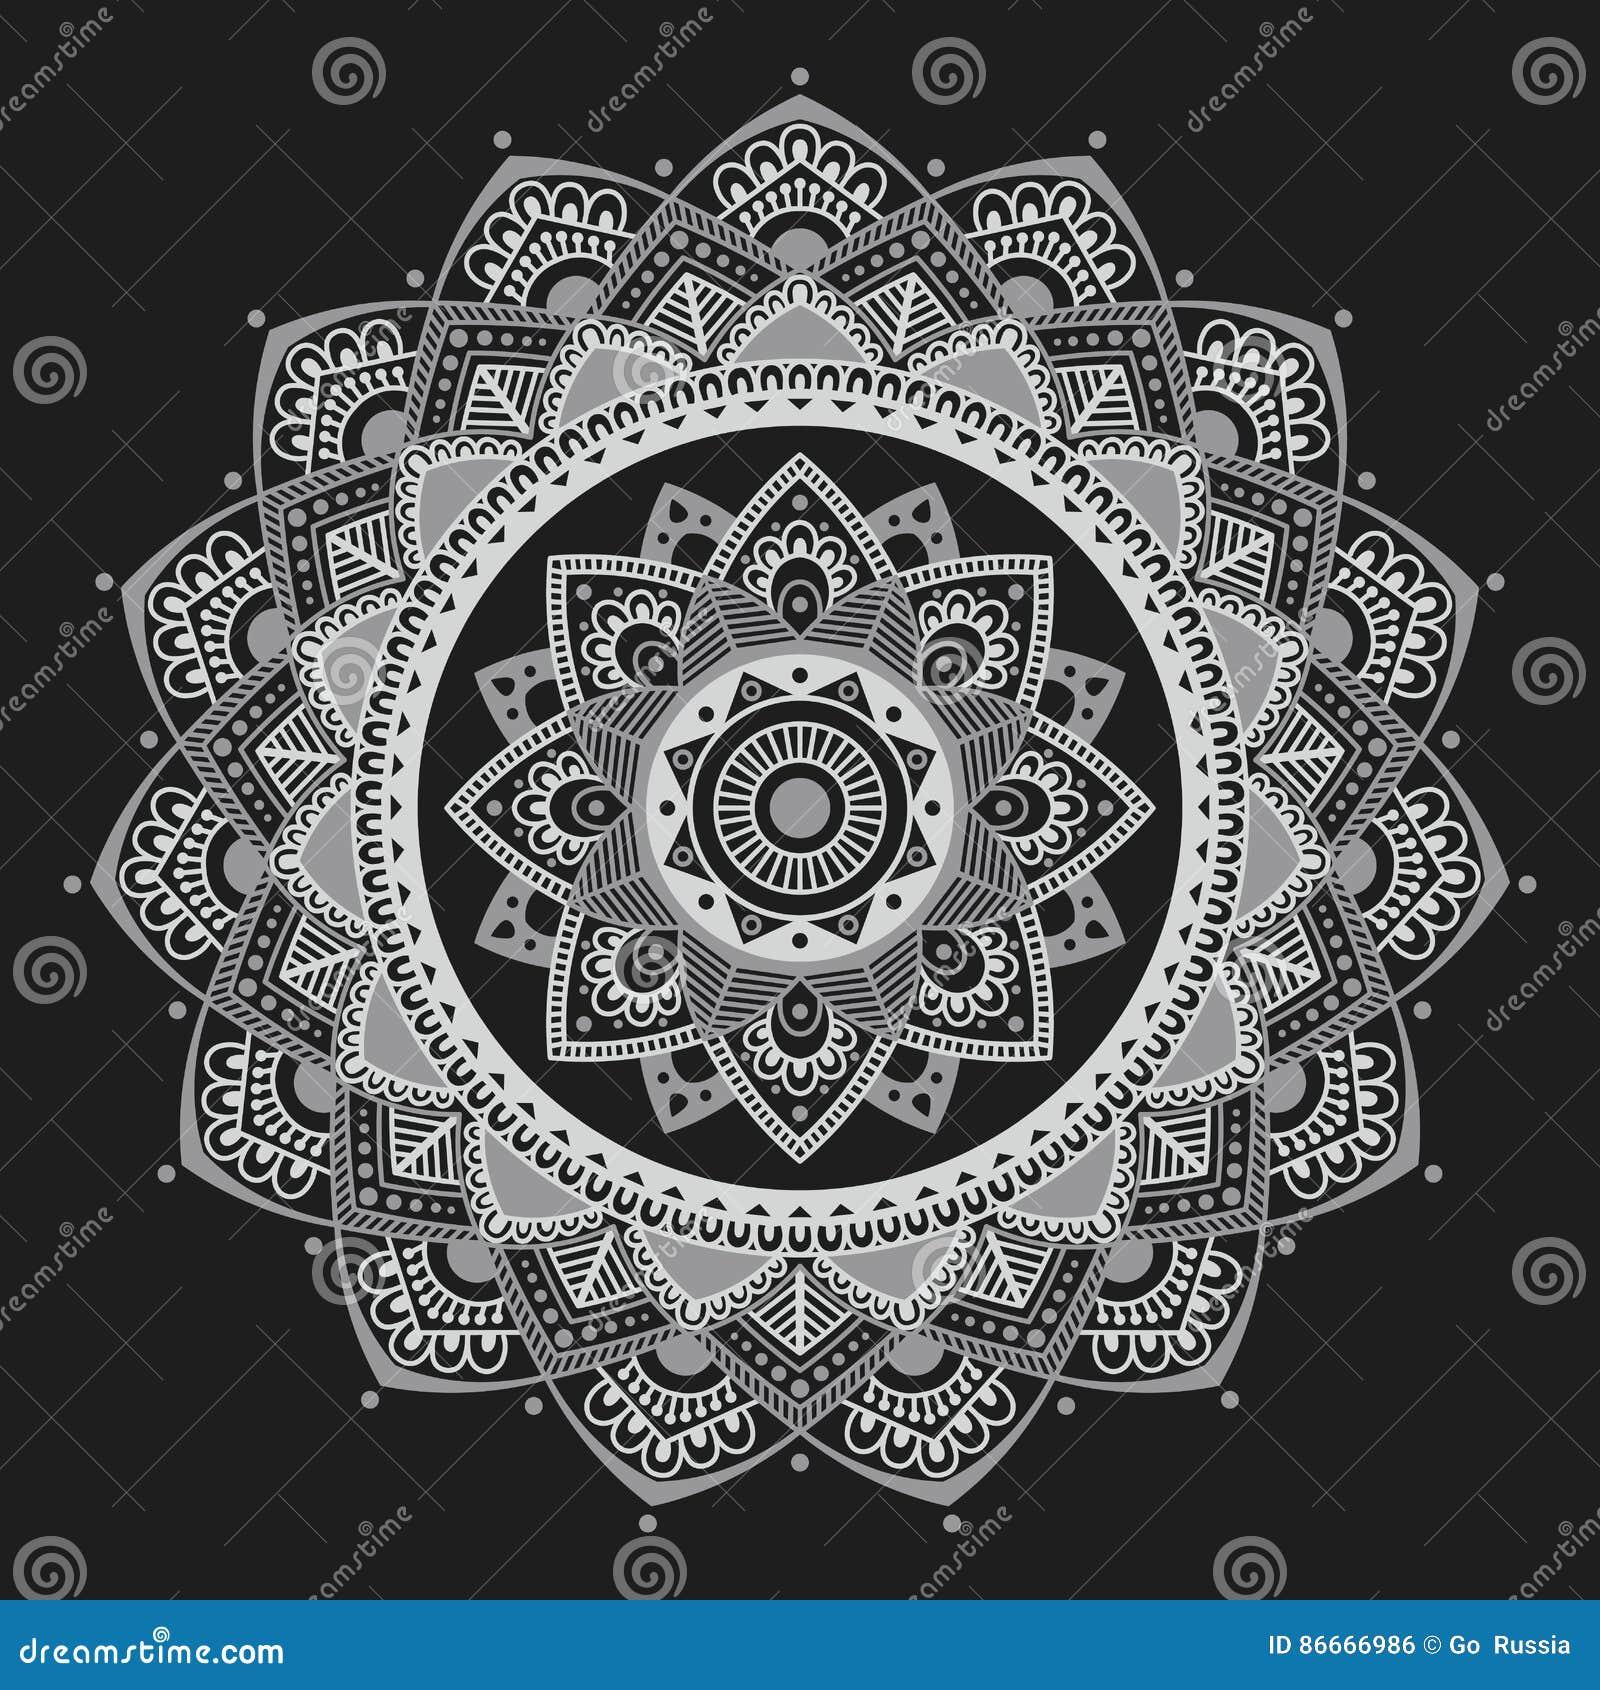 Mandala Indian Antistress Medallion Abstract Islamic Flower Arabic Henna Design Yoga Symbol Vector Illustration